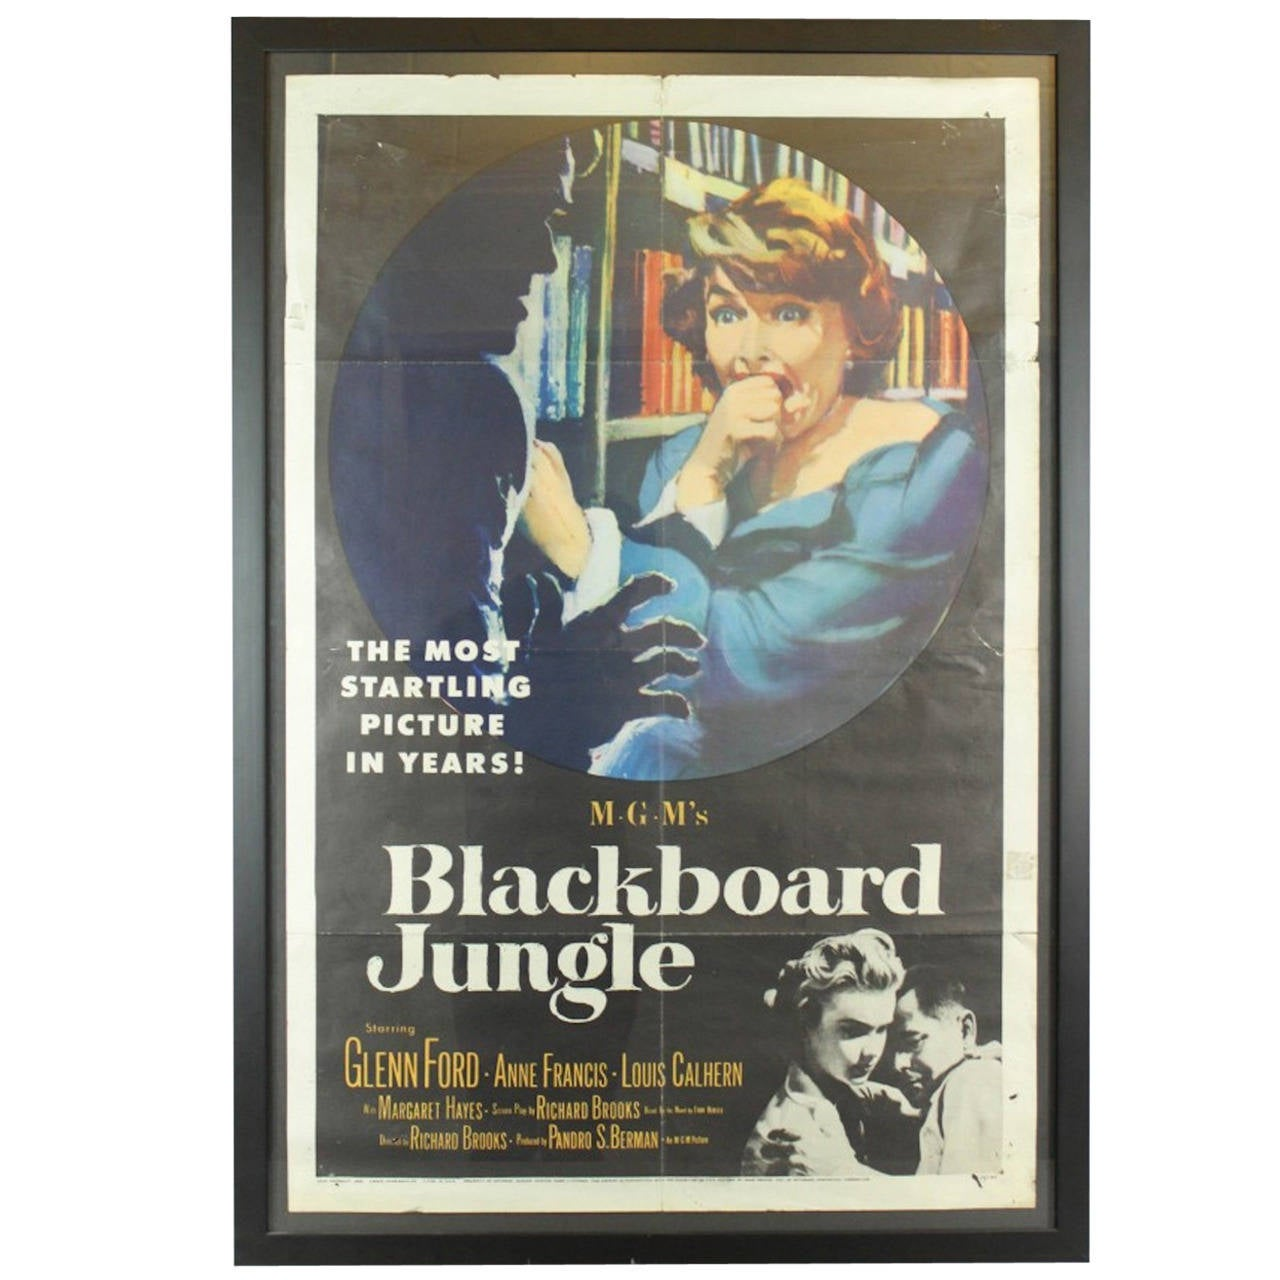 """Blackboard Jungle"" Original Vintage Movie Poster at 1stdibs"